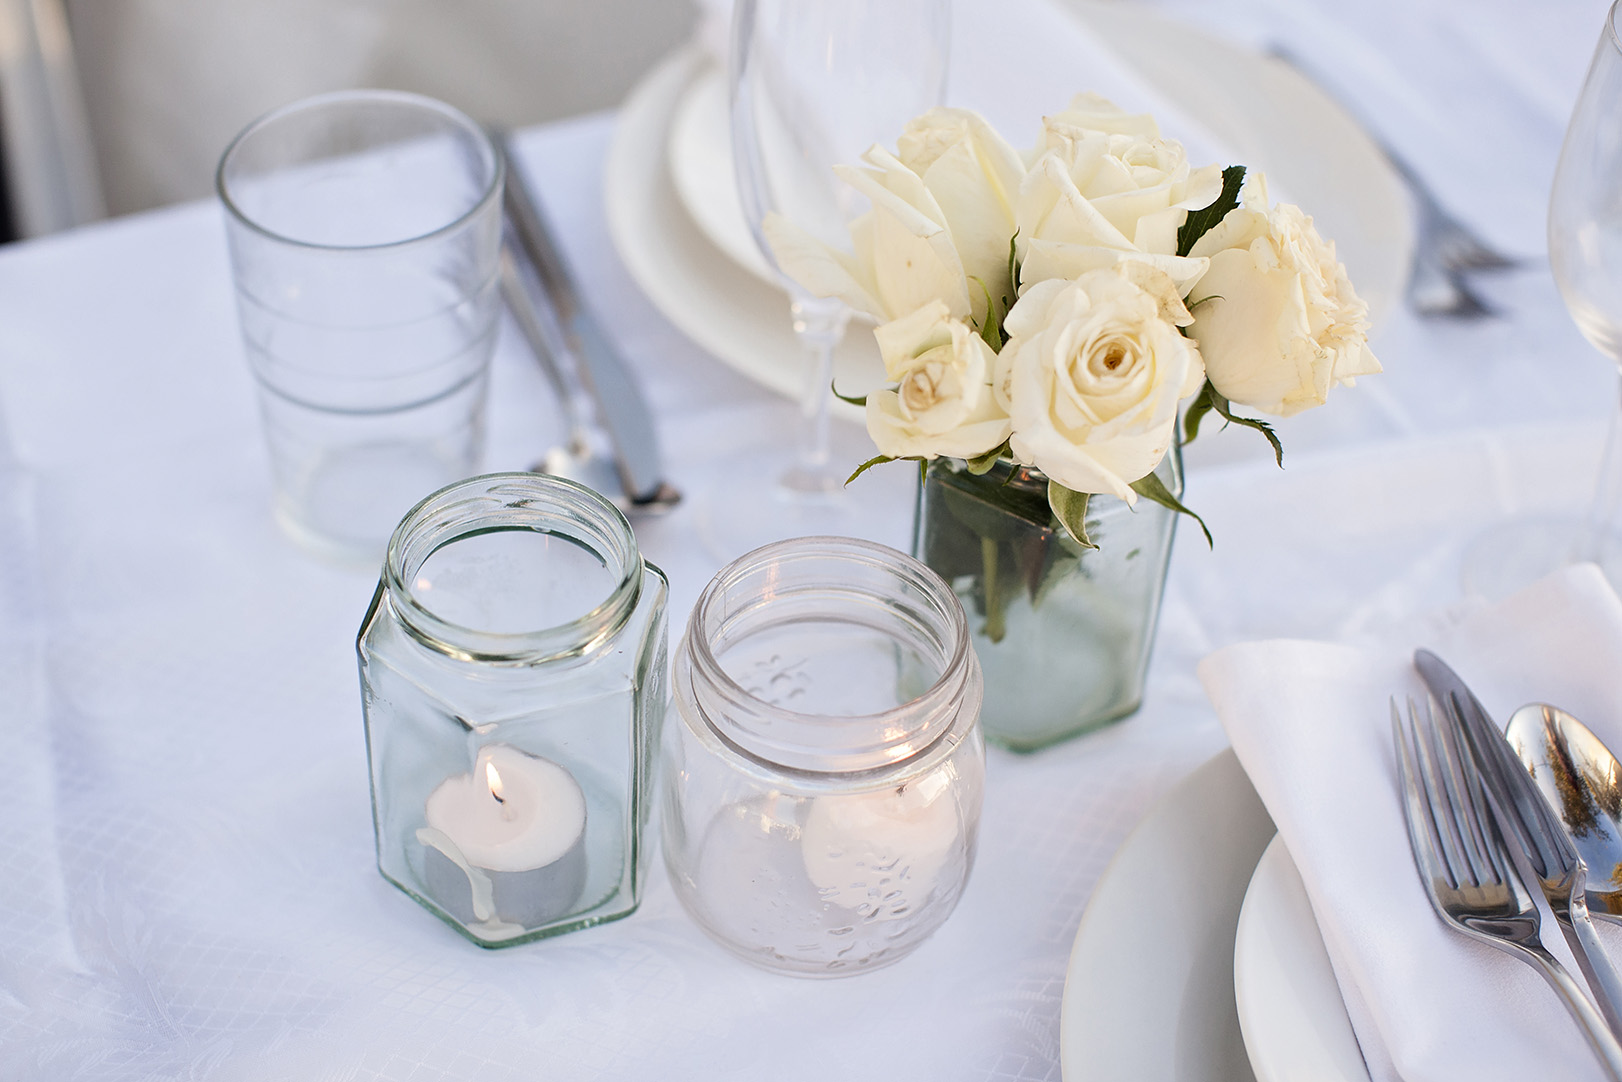 Diner En Blanc - Melbourne Thirtieth Photography 008.jpg